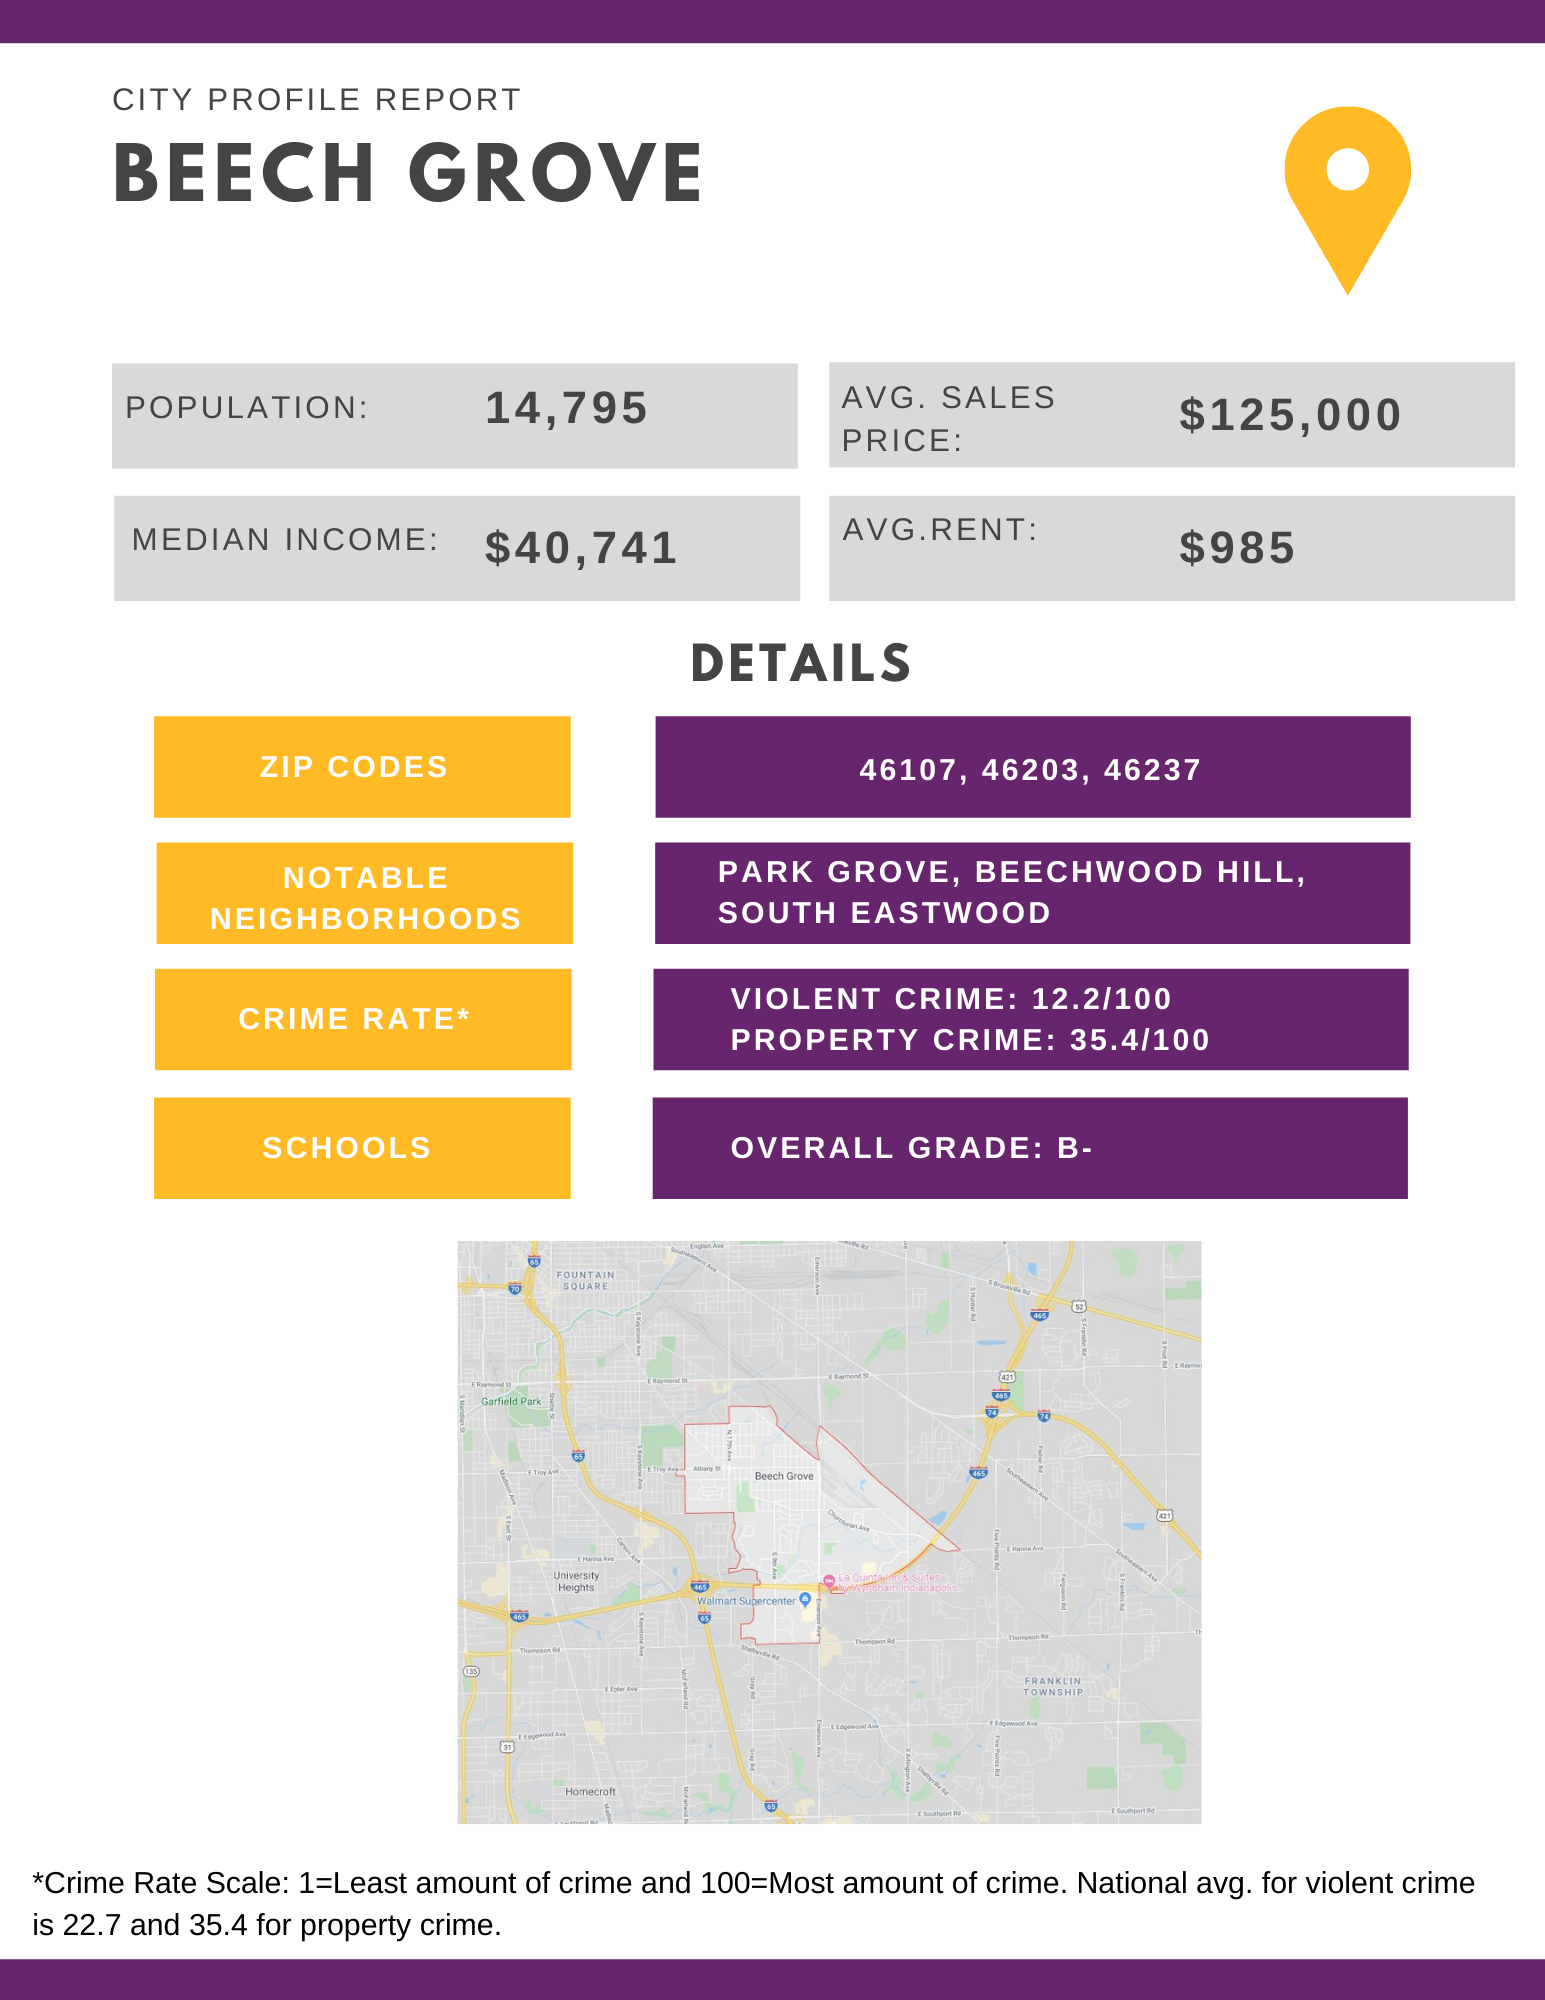 Beech Grove City Profile Report